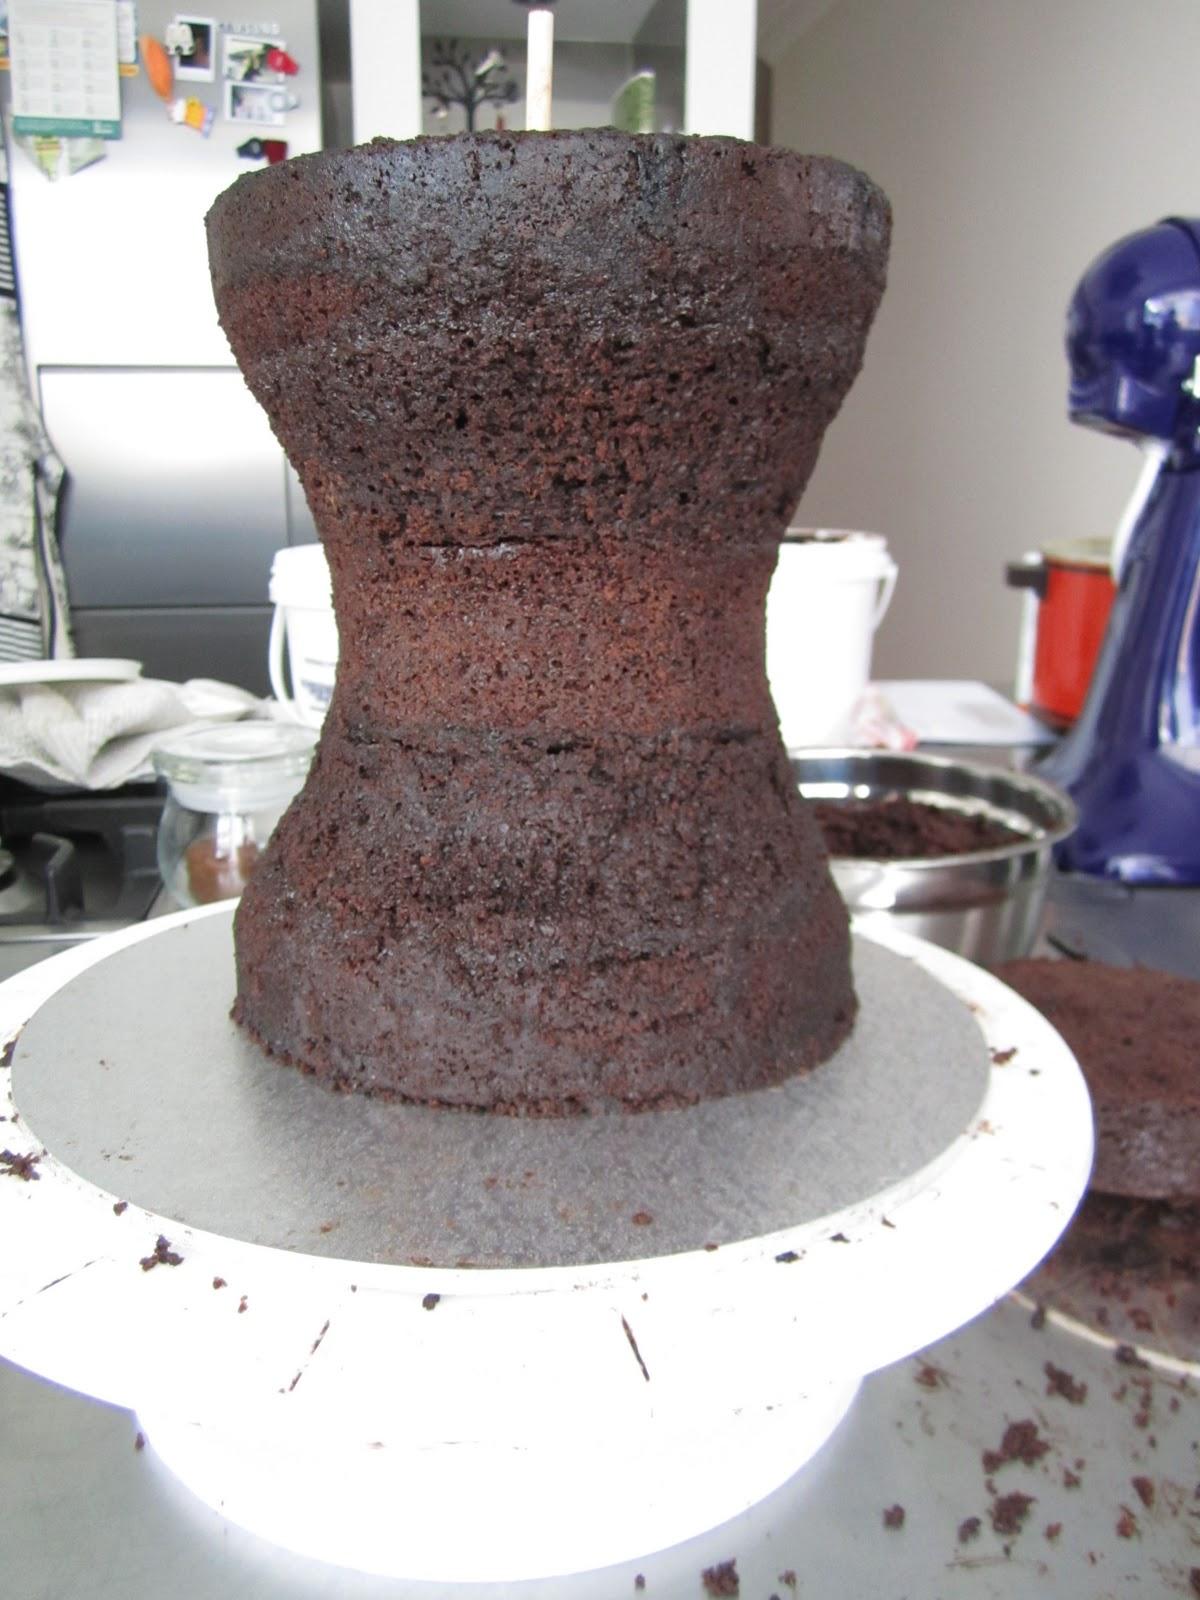 Putting Hot Cake In Fridge